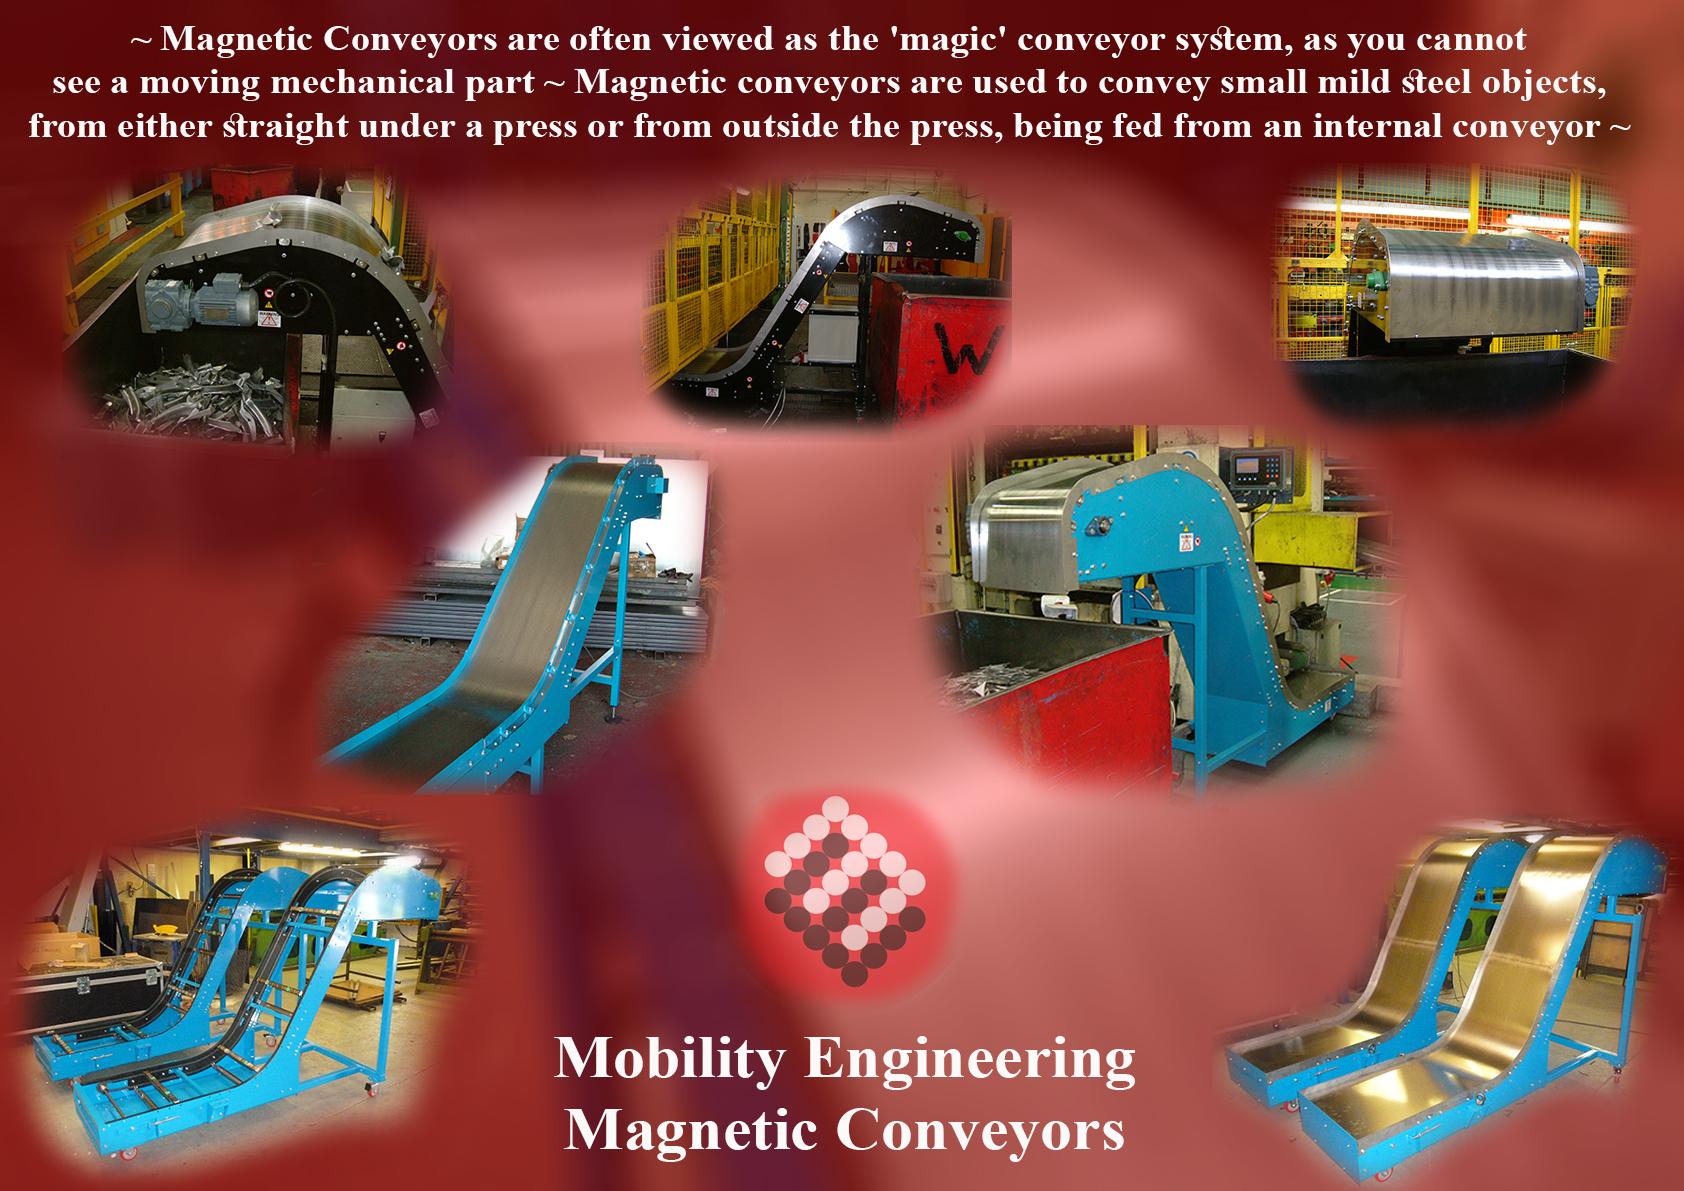 Mobility Engineering (Cheshire) Ltd Lymm 01925 755923